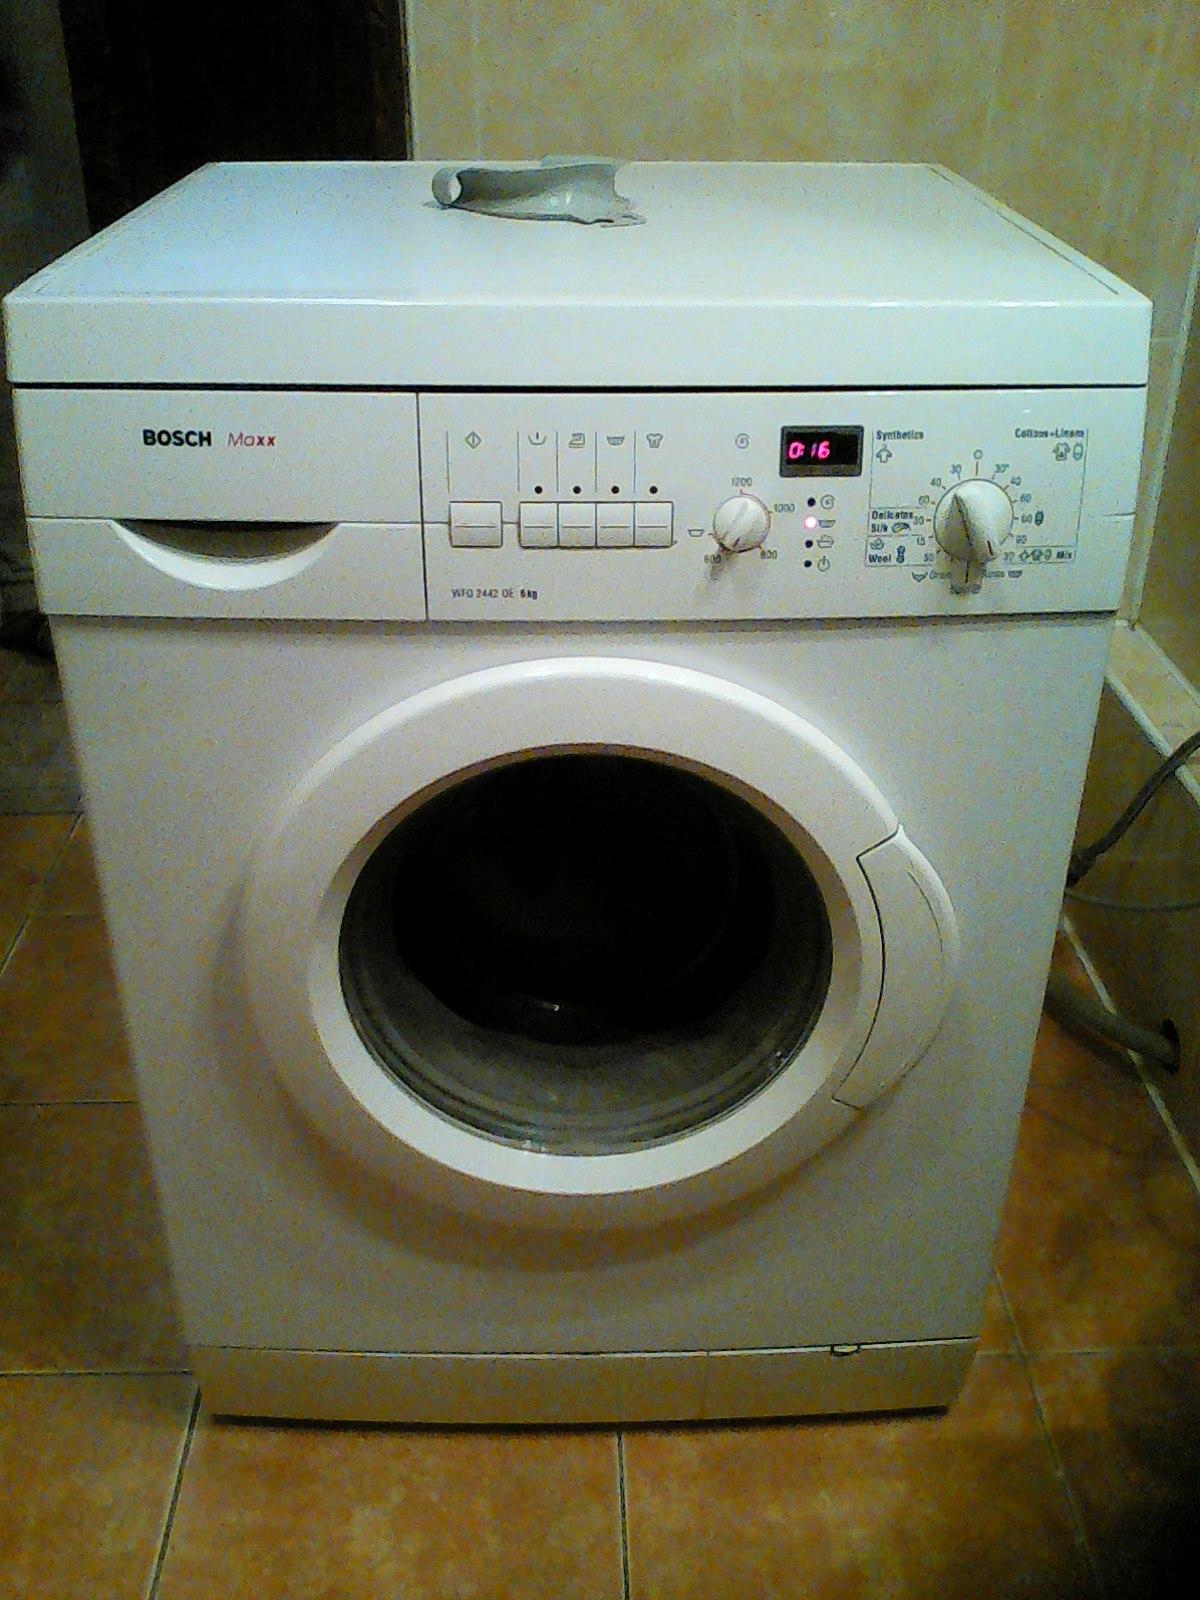 Автоматическая стиральная машина Bosch Maxx WFO 2442 OE